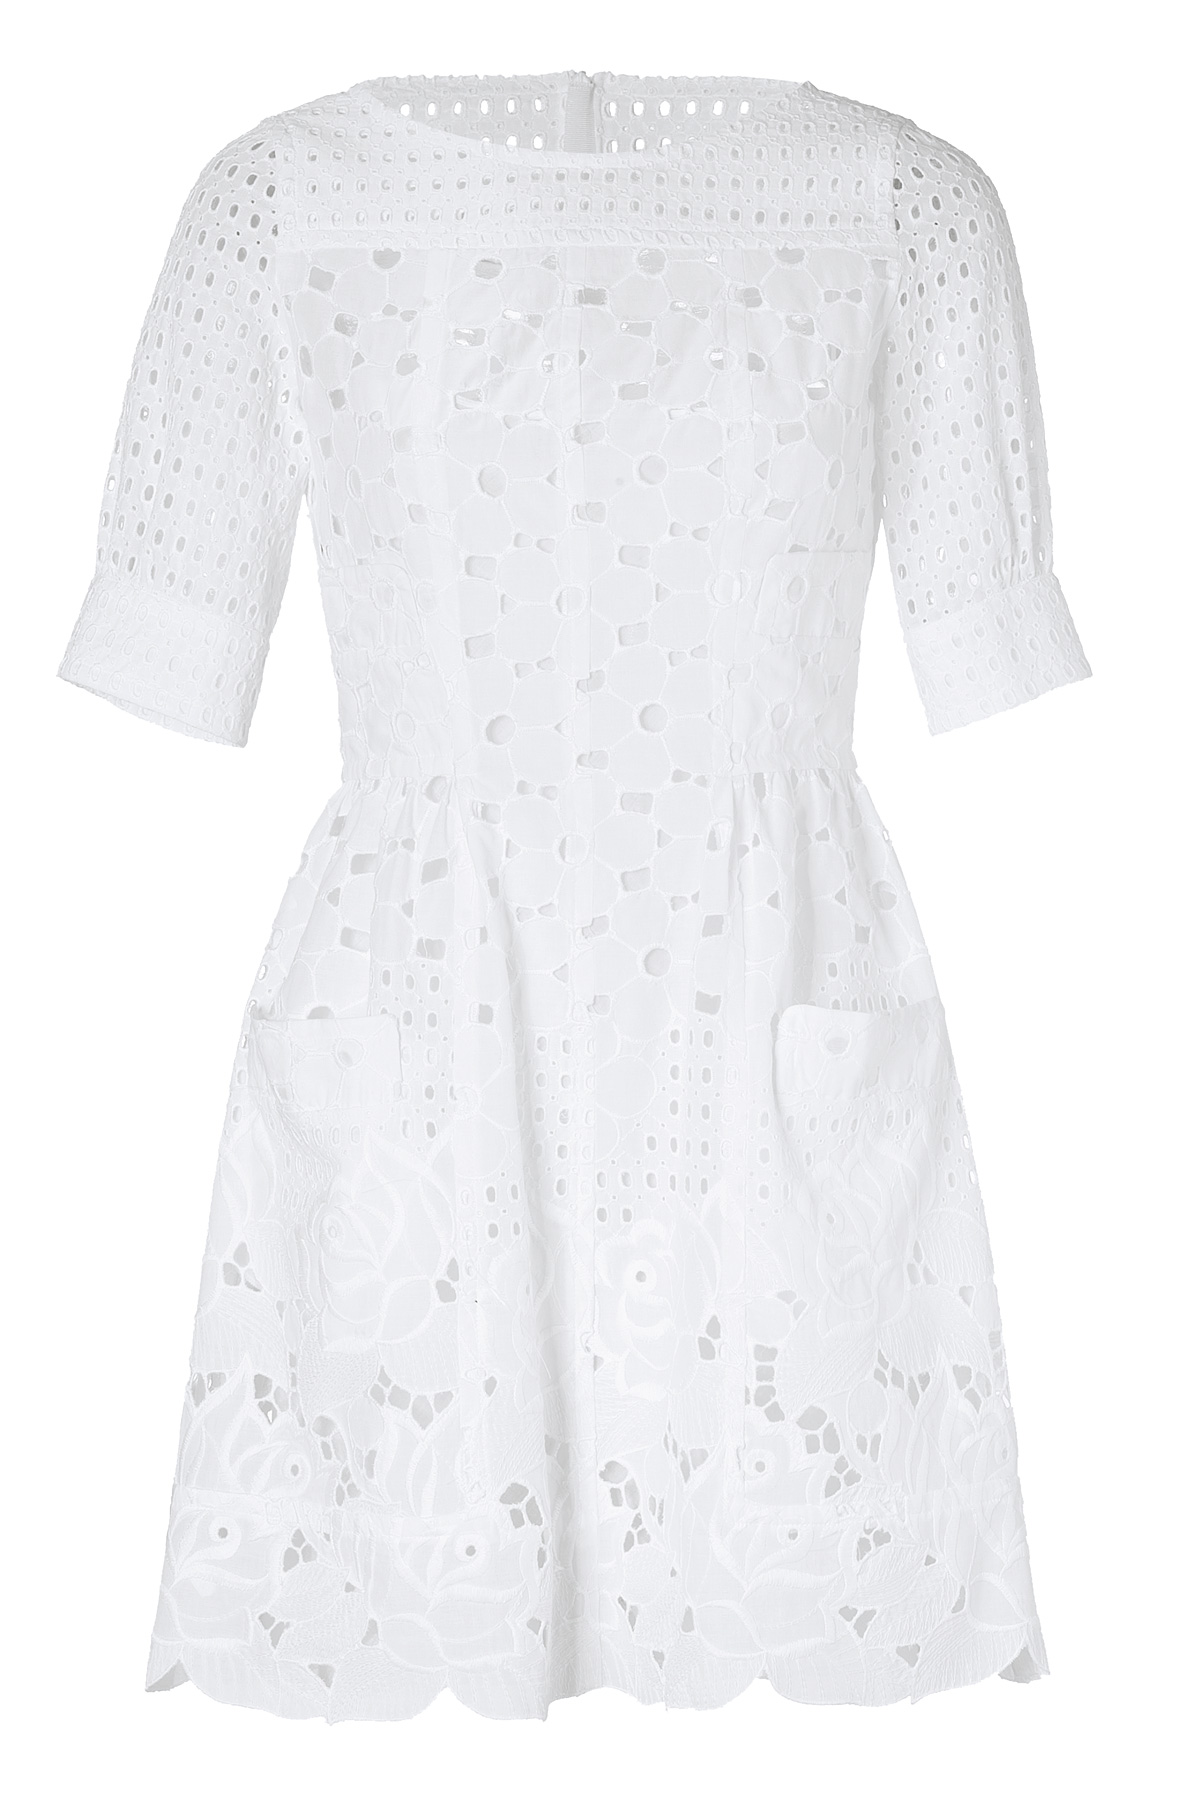 Moschino White Cotton Dress in White  Lyst